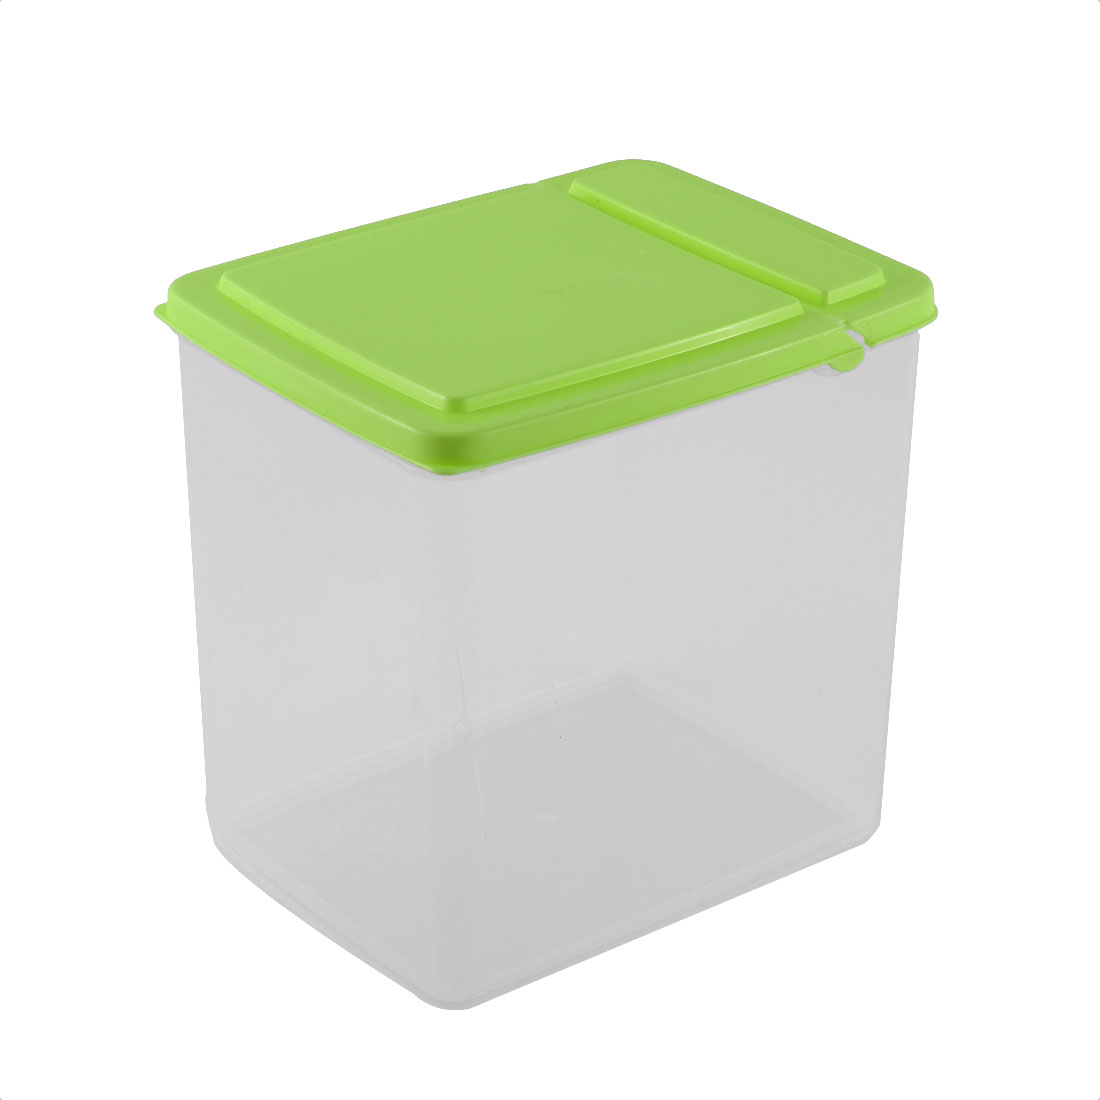 Kitchen Pantry Refrigerator Freezer Plastic Transparent Storage Box Organizer 15x11x16cm Green